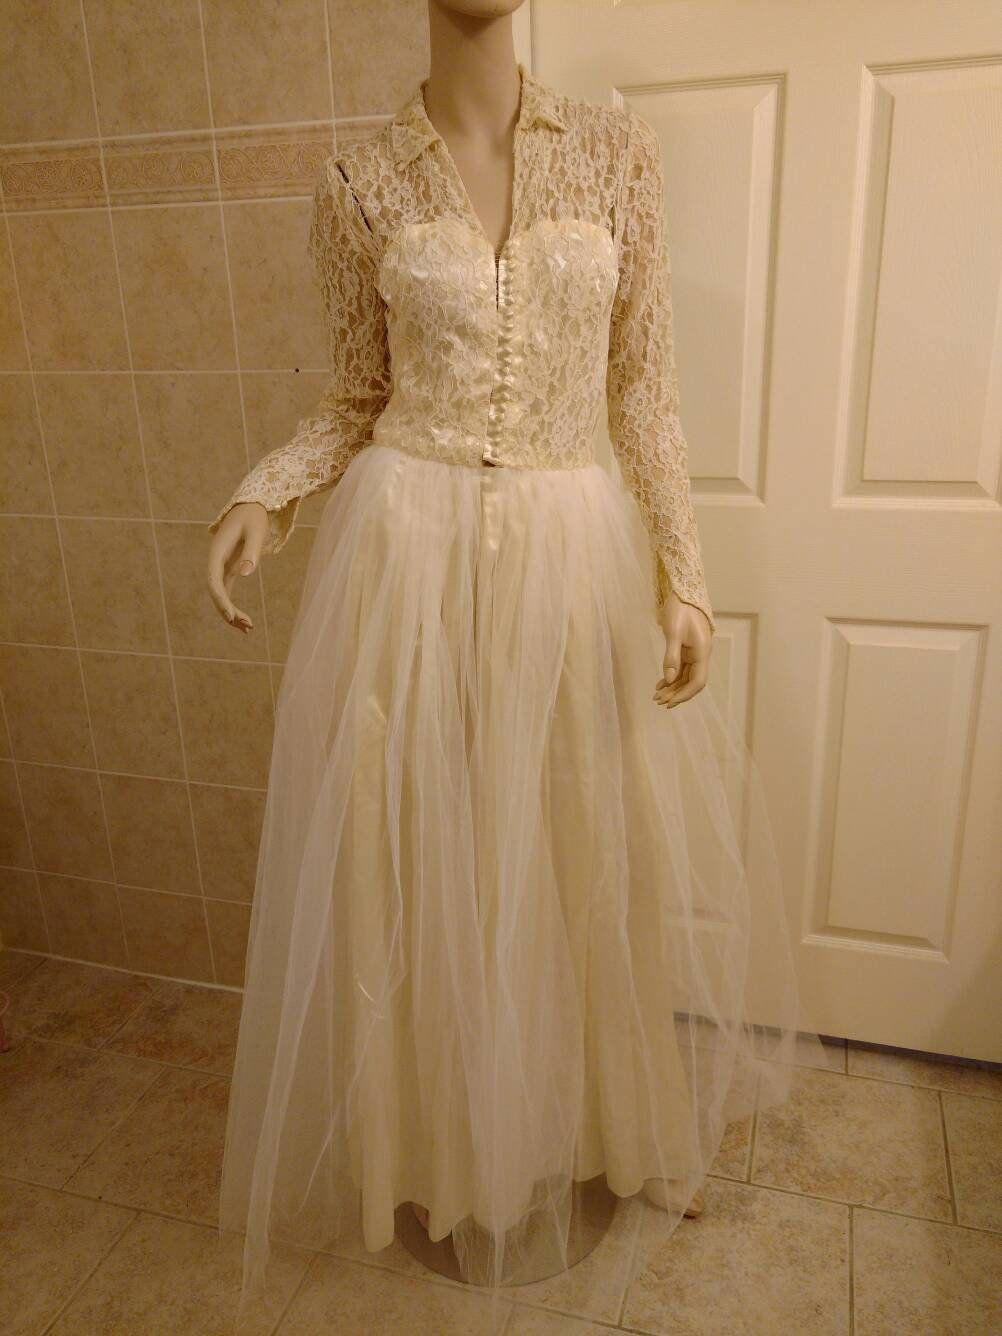 Brown Vintage Lace Floor Length Dresses